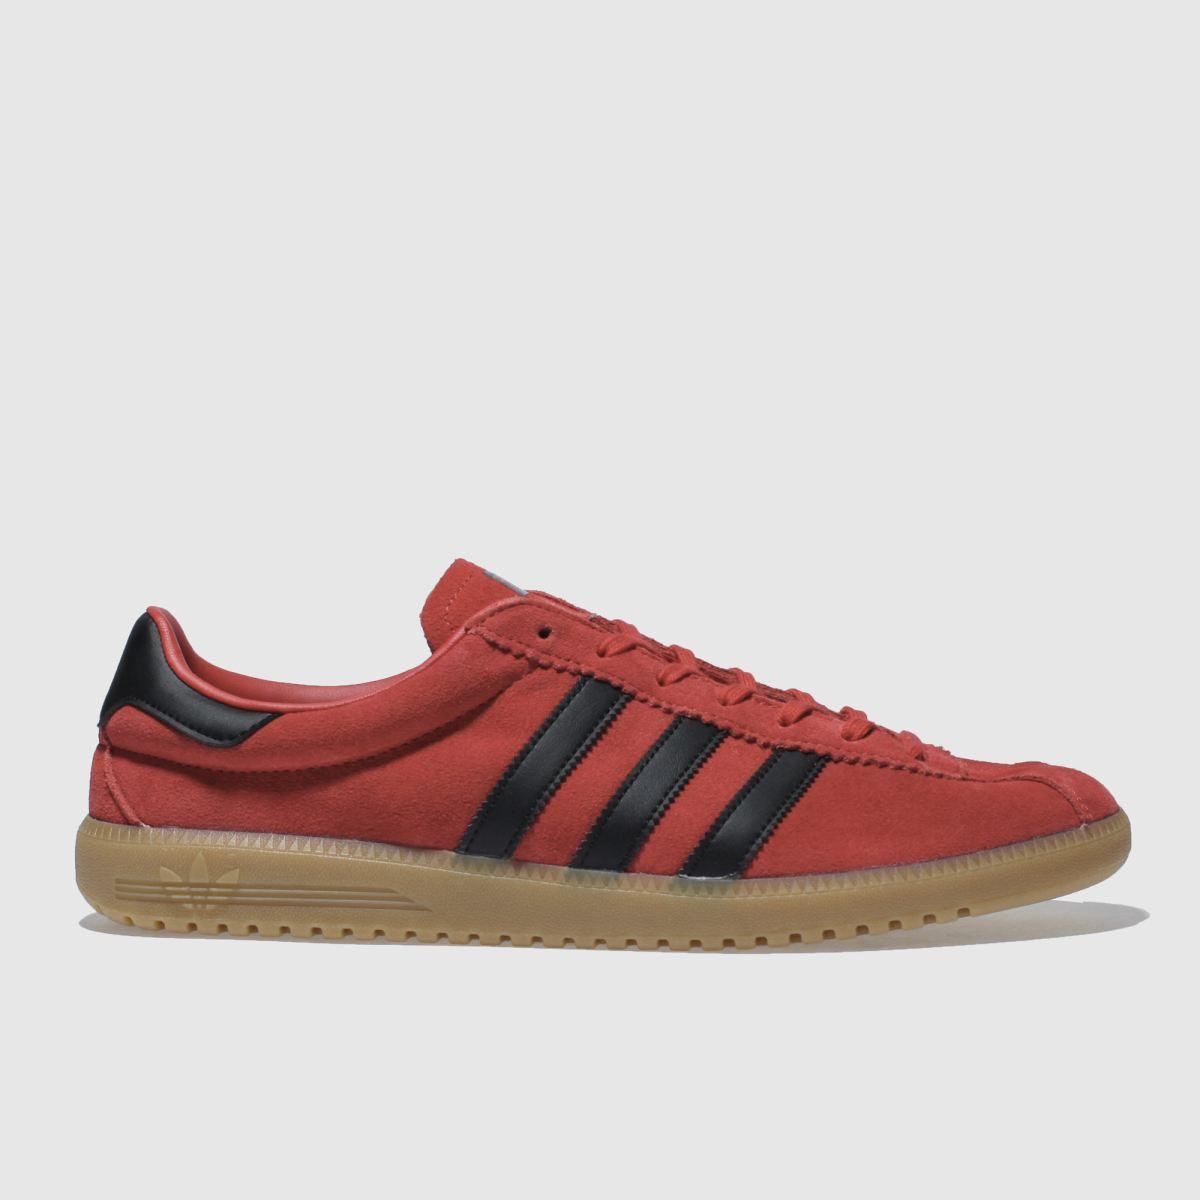 Adidas Red Bermuda Trainers